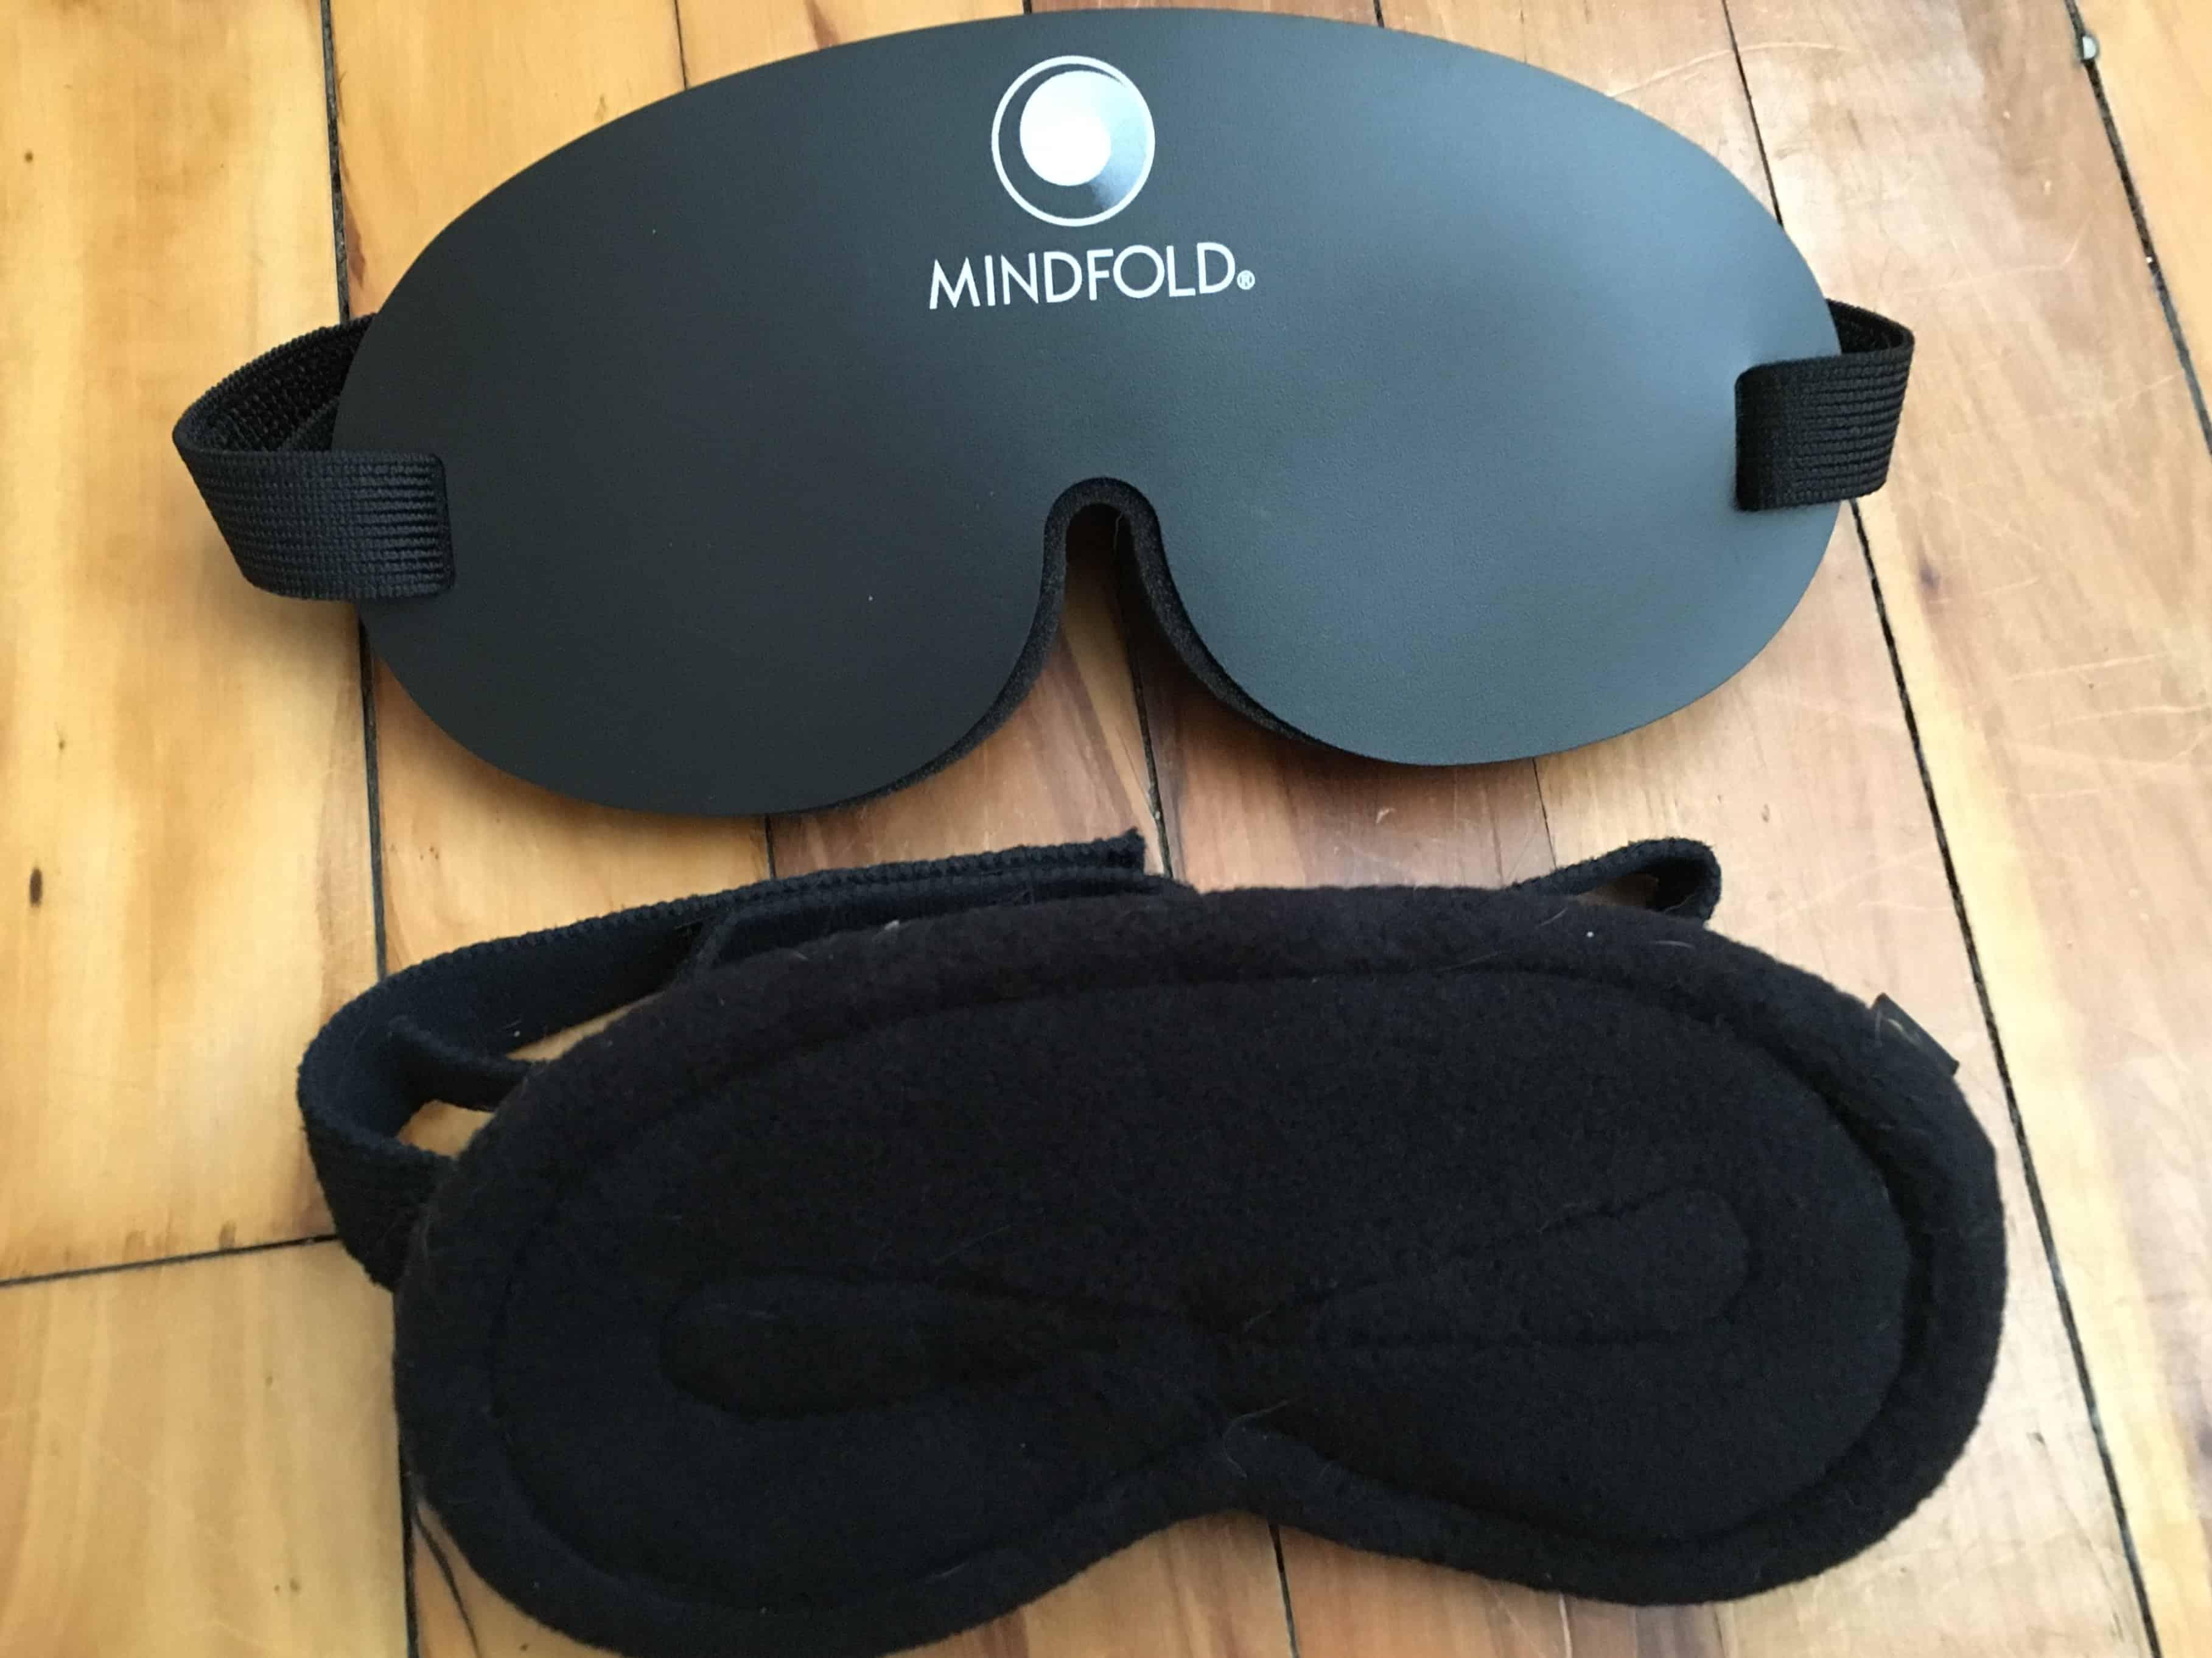 Best-Sleep-Mask-for-Blocking-Light Best Sleep Masks